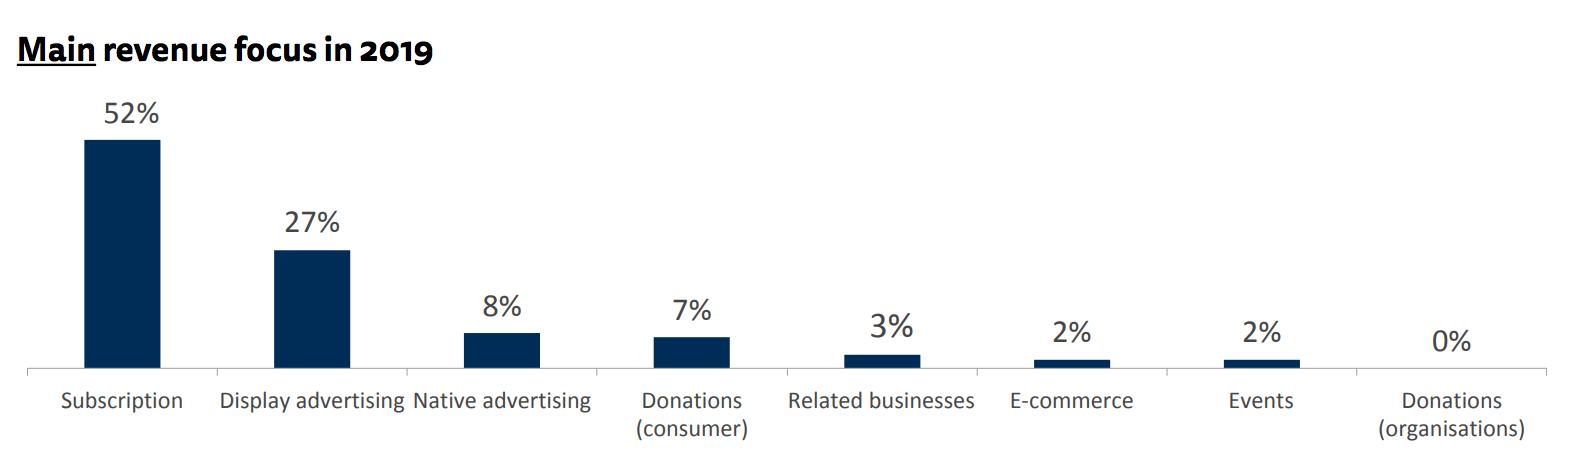 Main revenue focus in 2019 - publishing industry